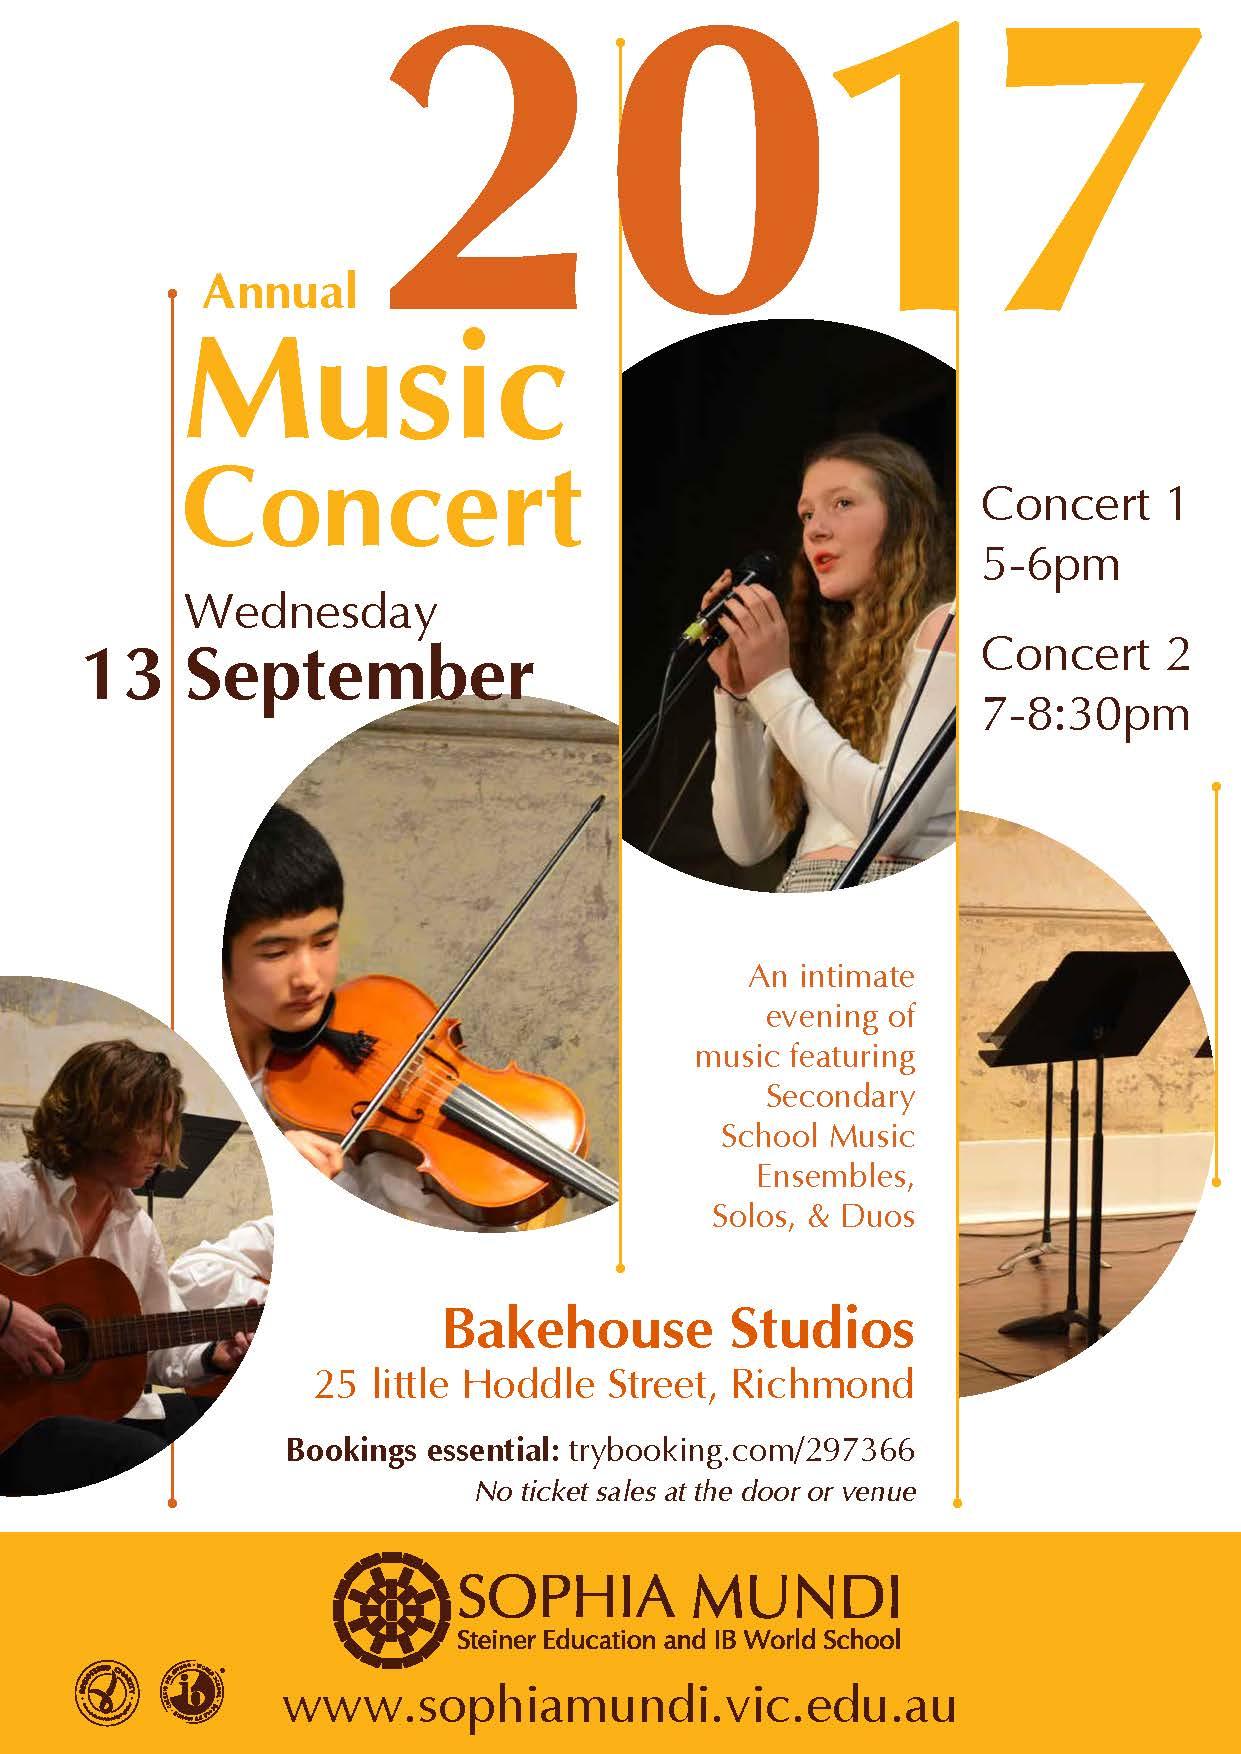 Annual Music Concert 2017